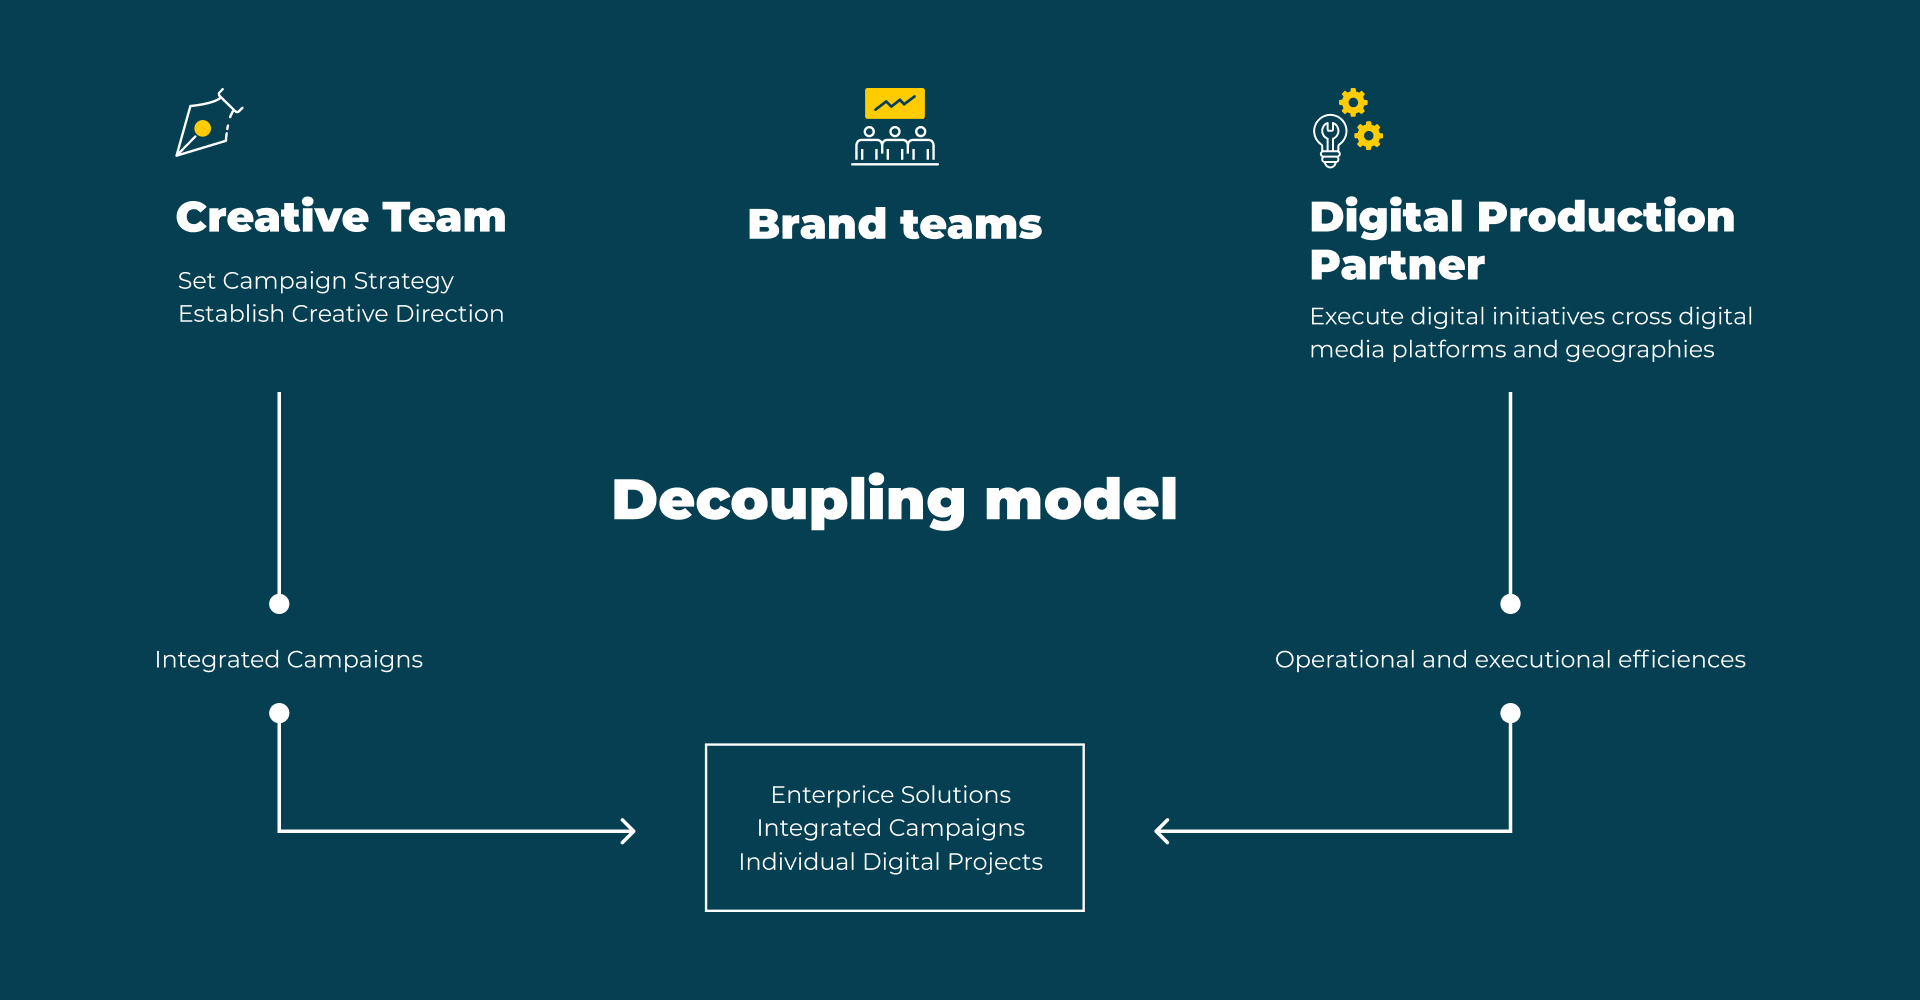 decoupling model